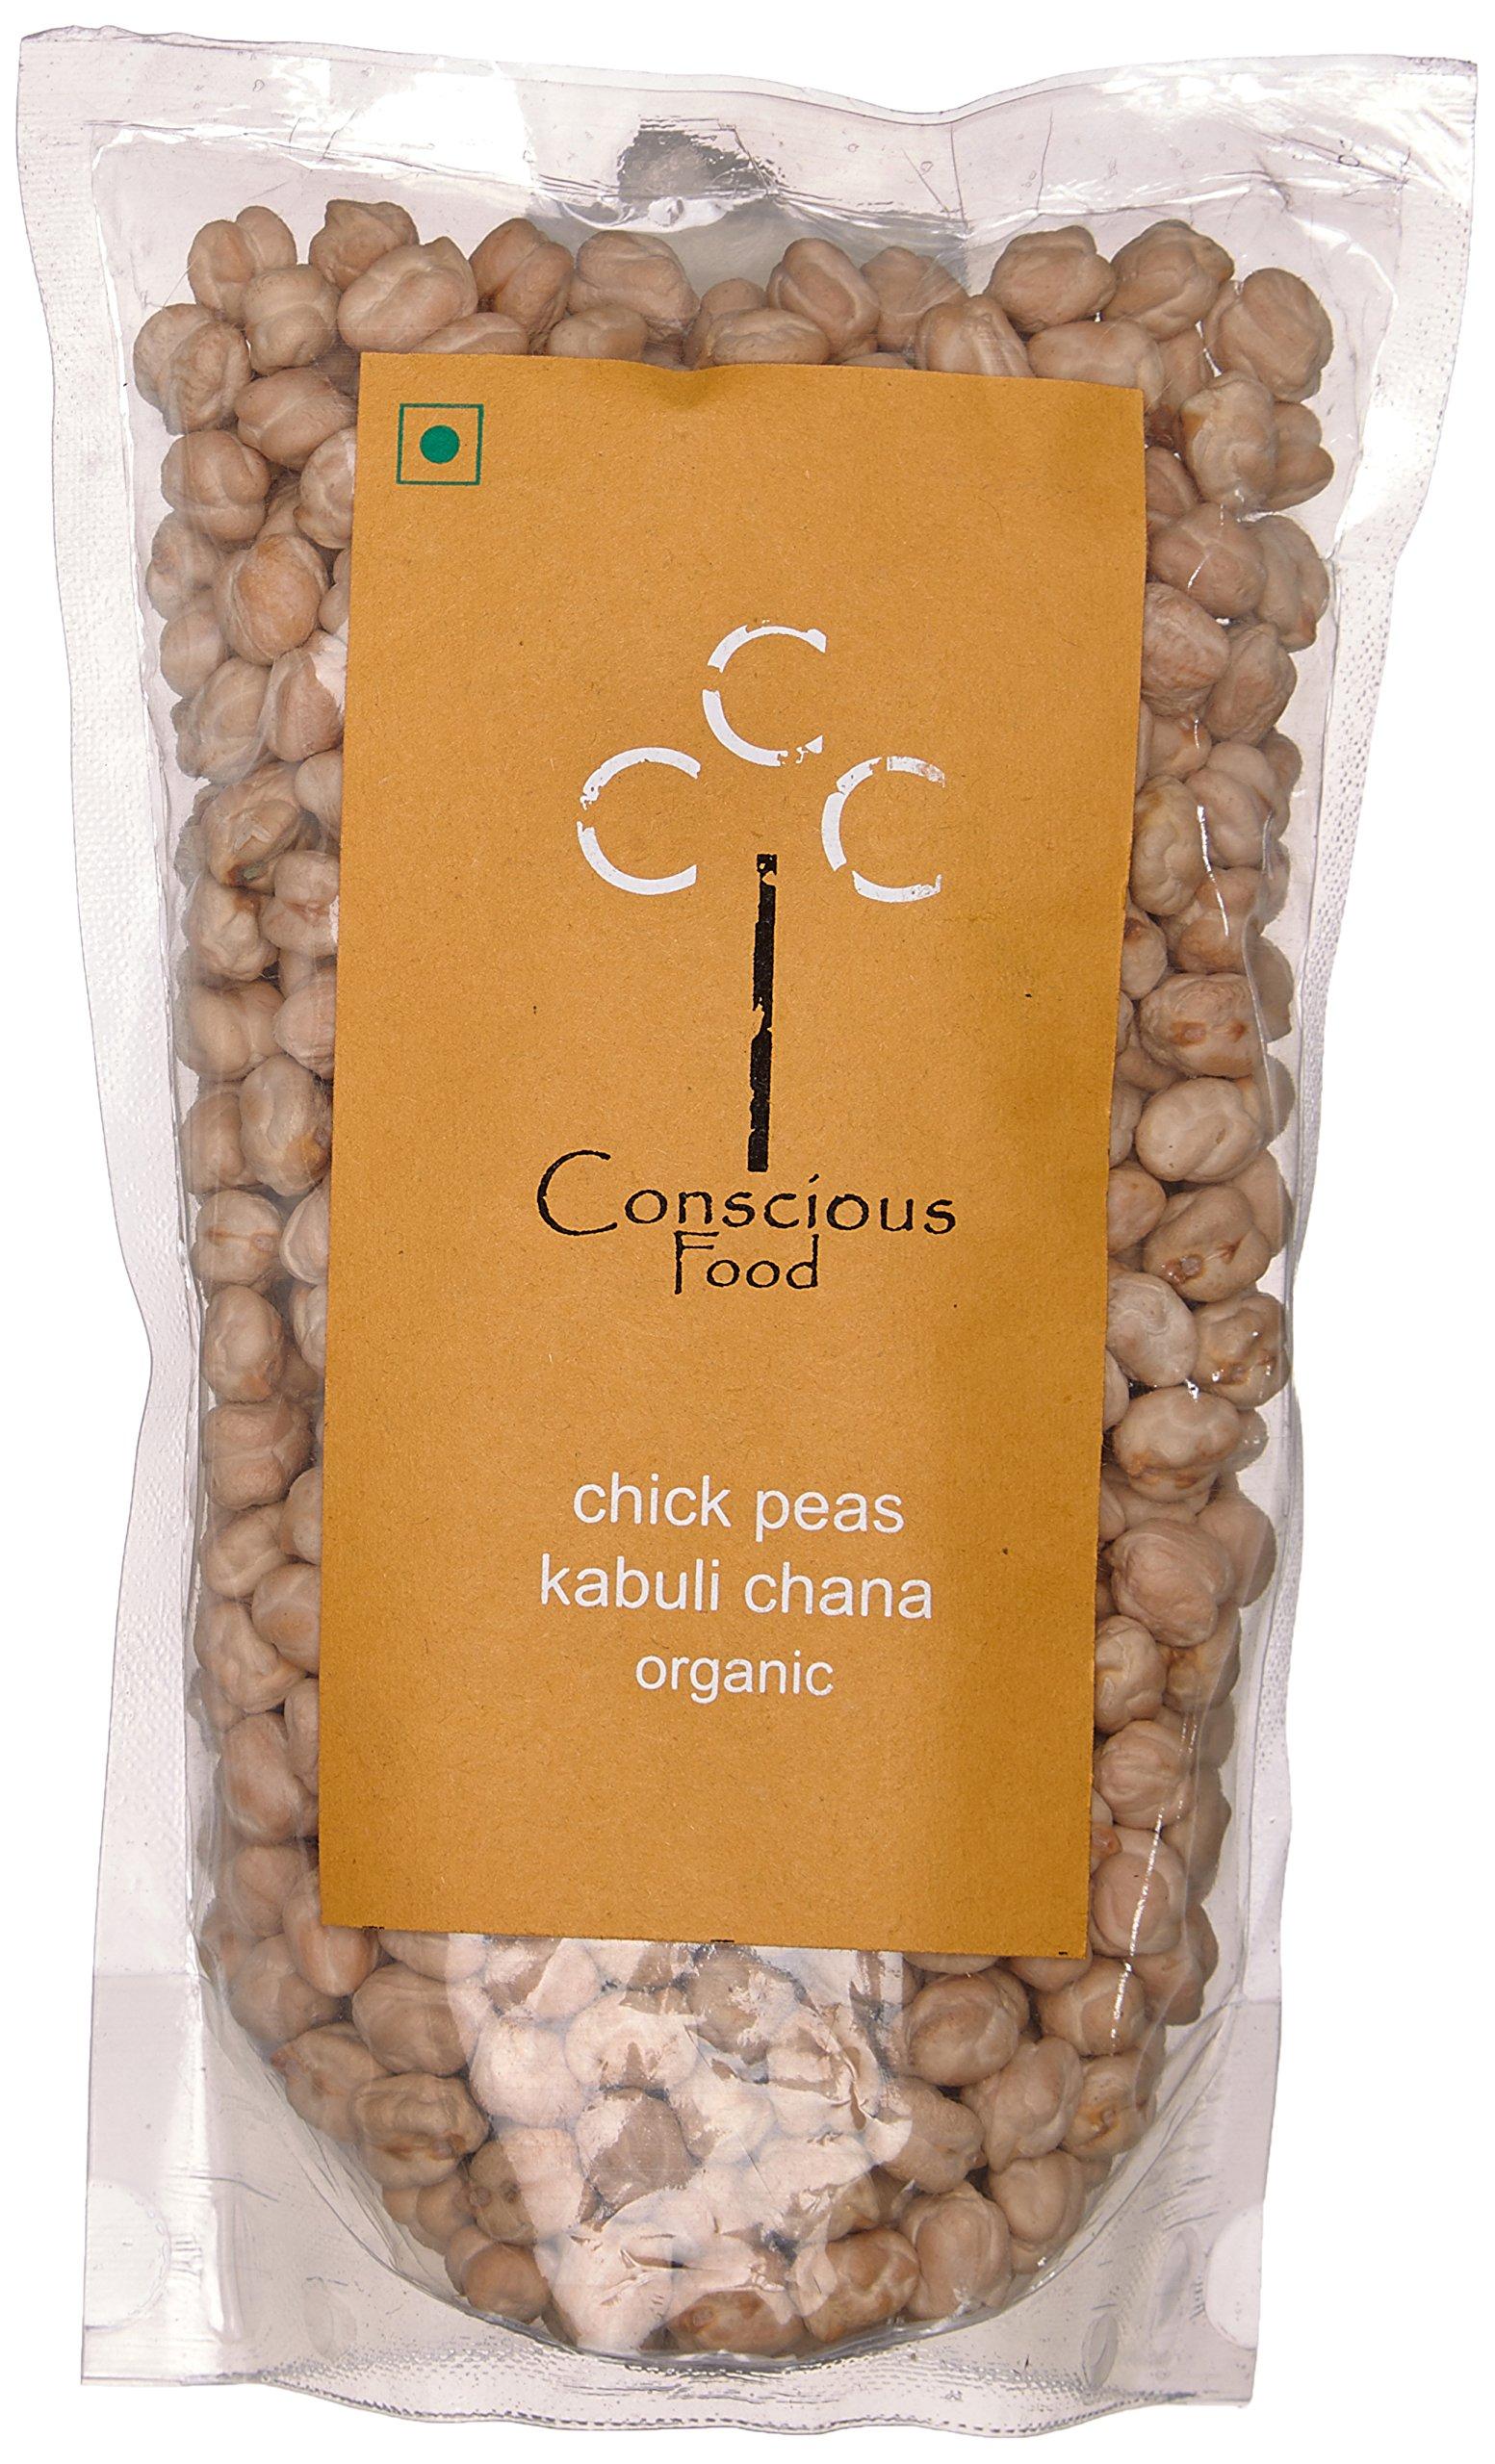 Conscious Food Organic Chick Peas (Kabuli Chana), 500g